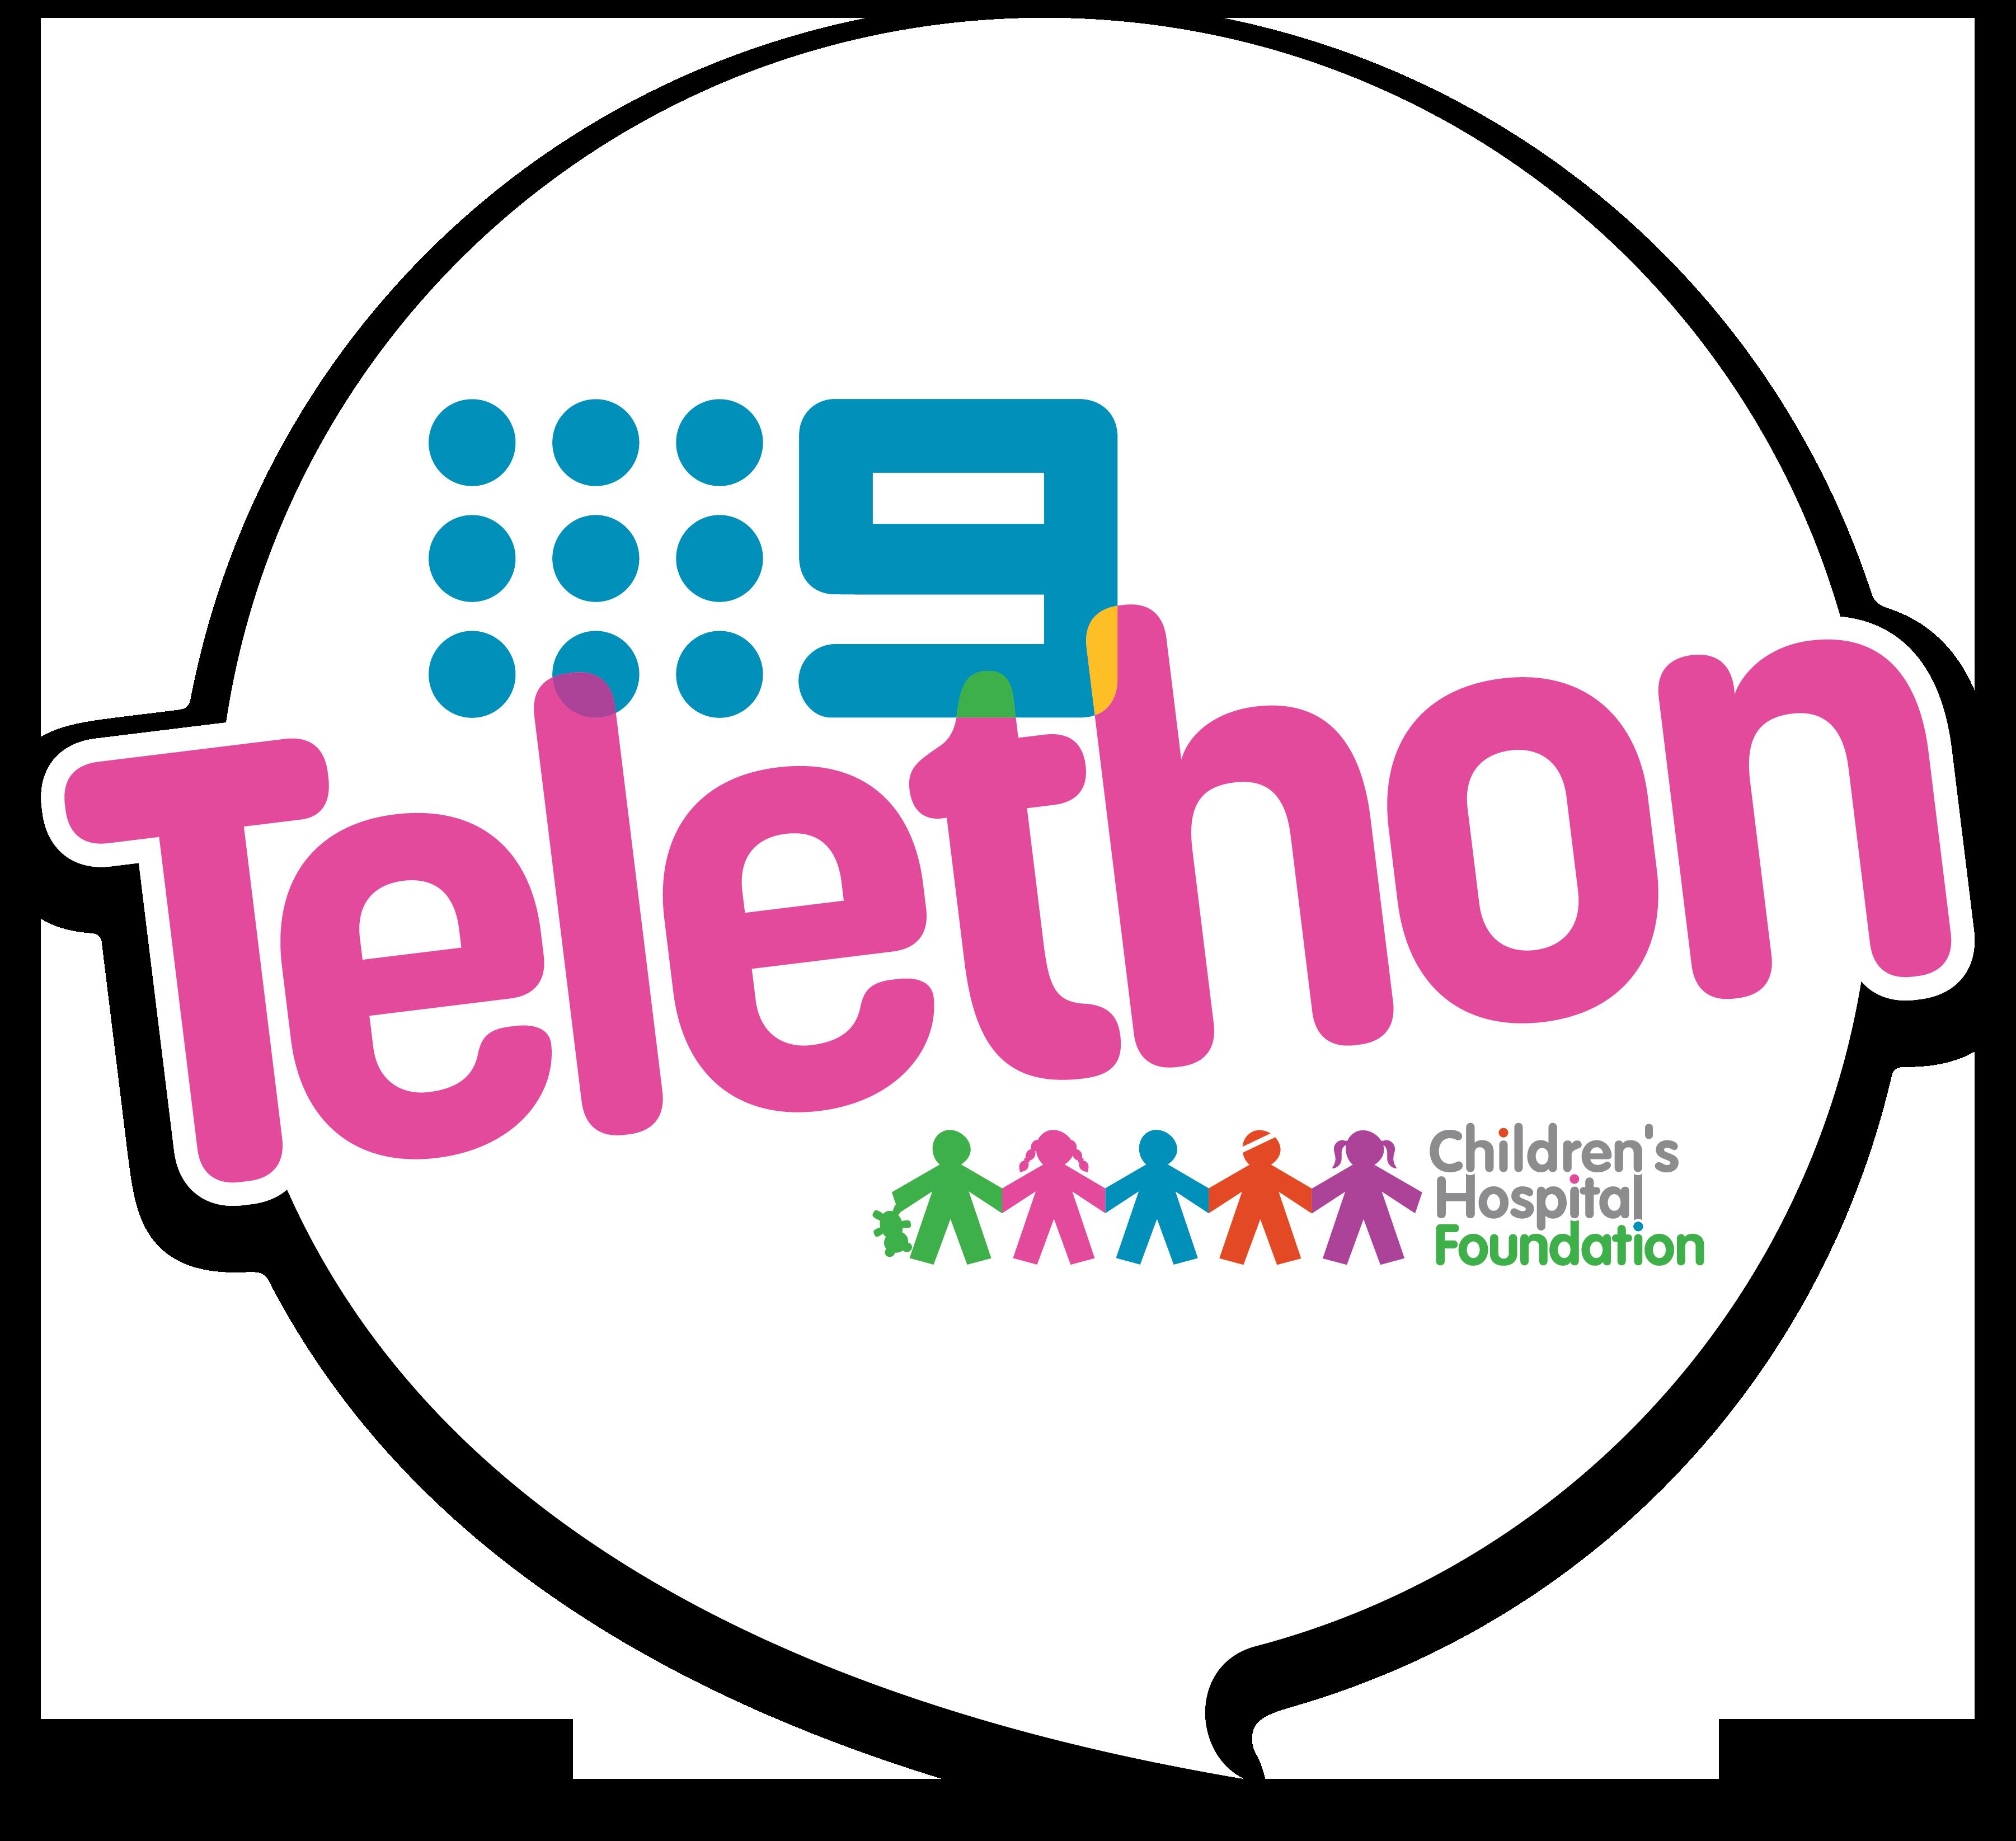 Children's Hospital Foundation Community Fundraising